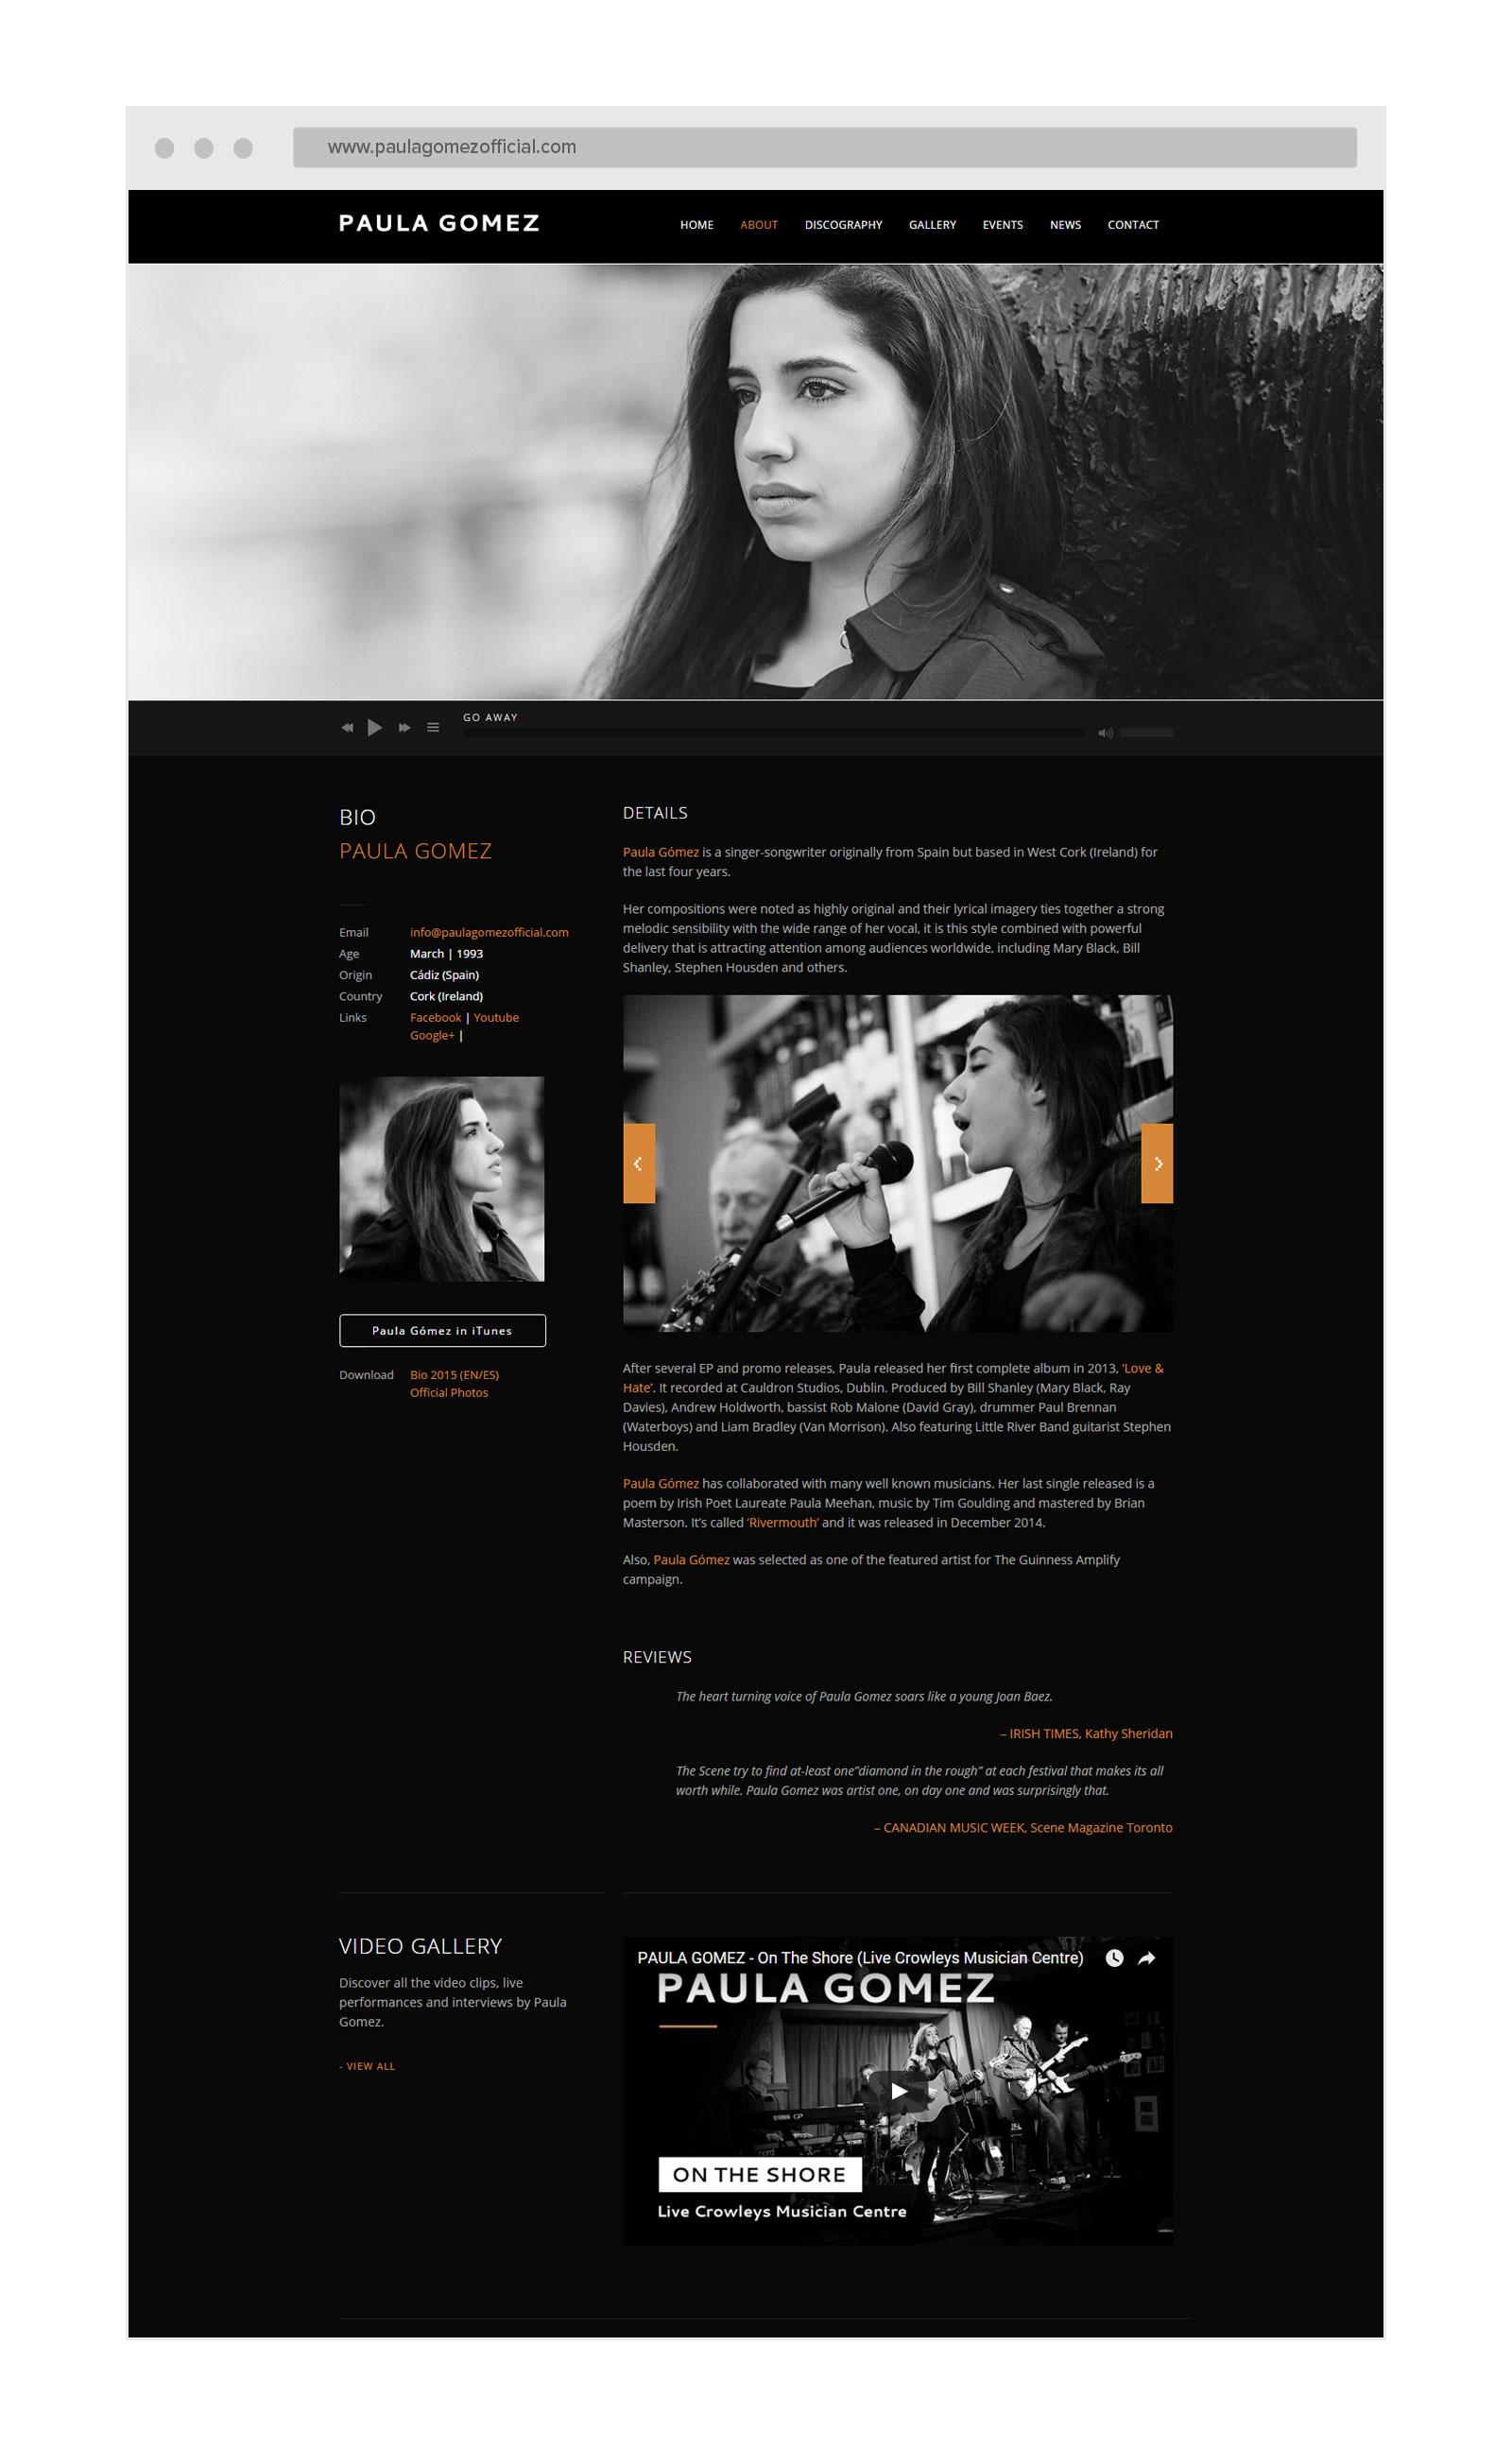 paula-gomez-website-about